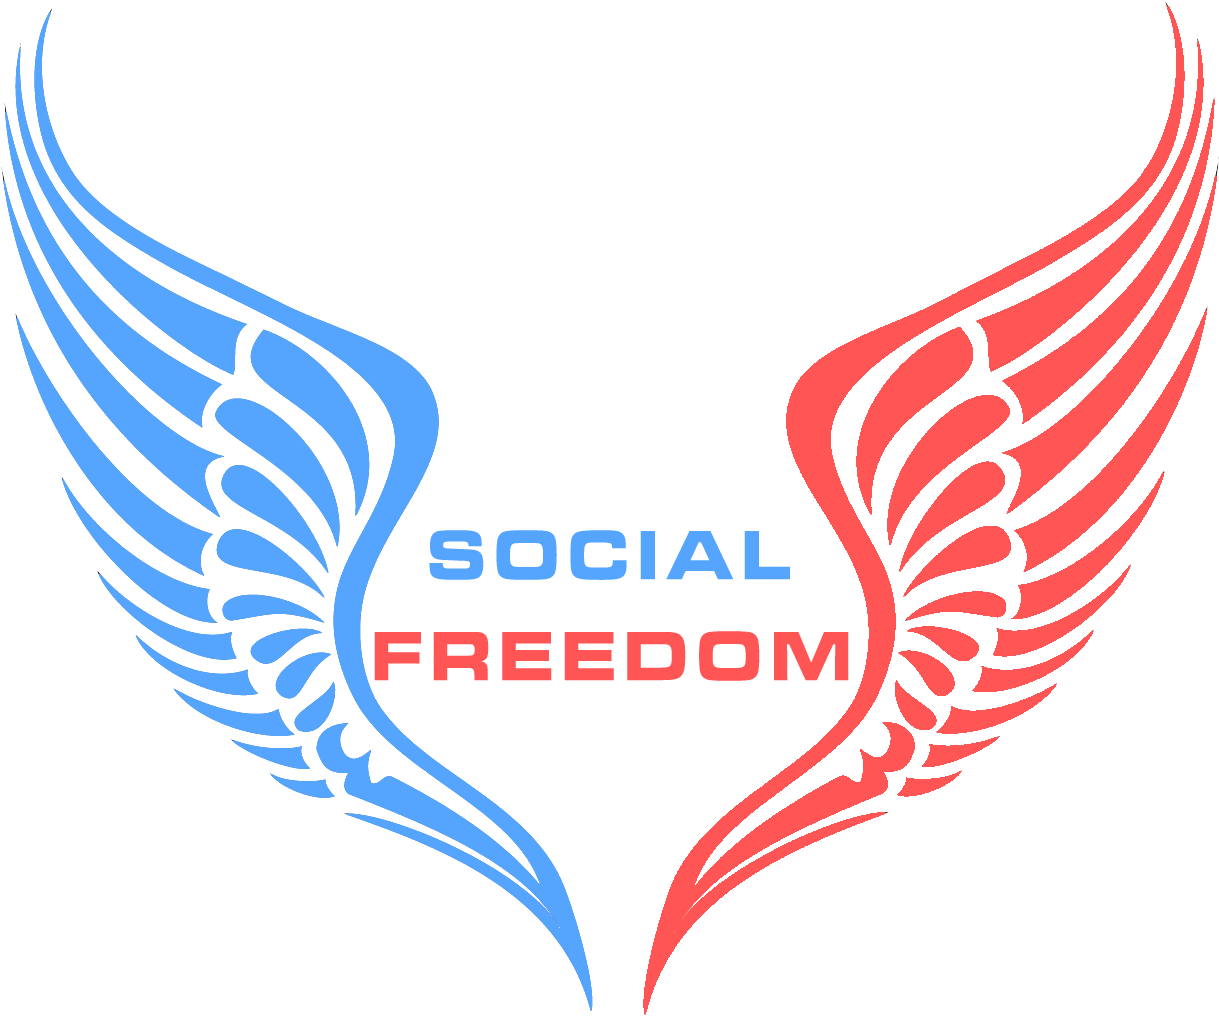 Freedom clipart freedom symbol, Freedom freedom symbol ...